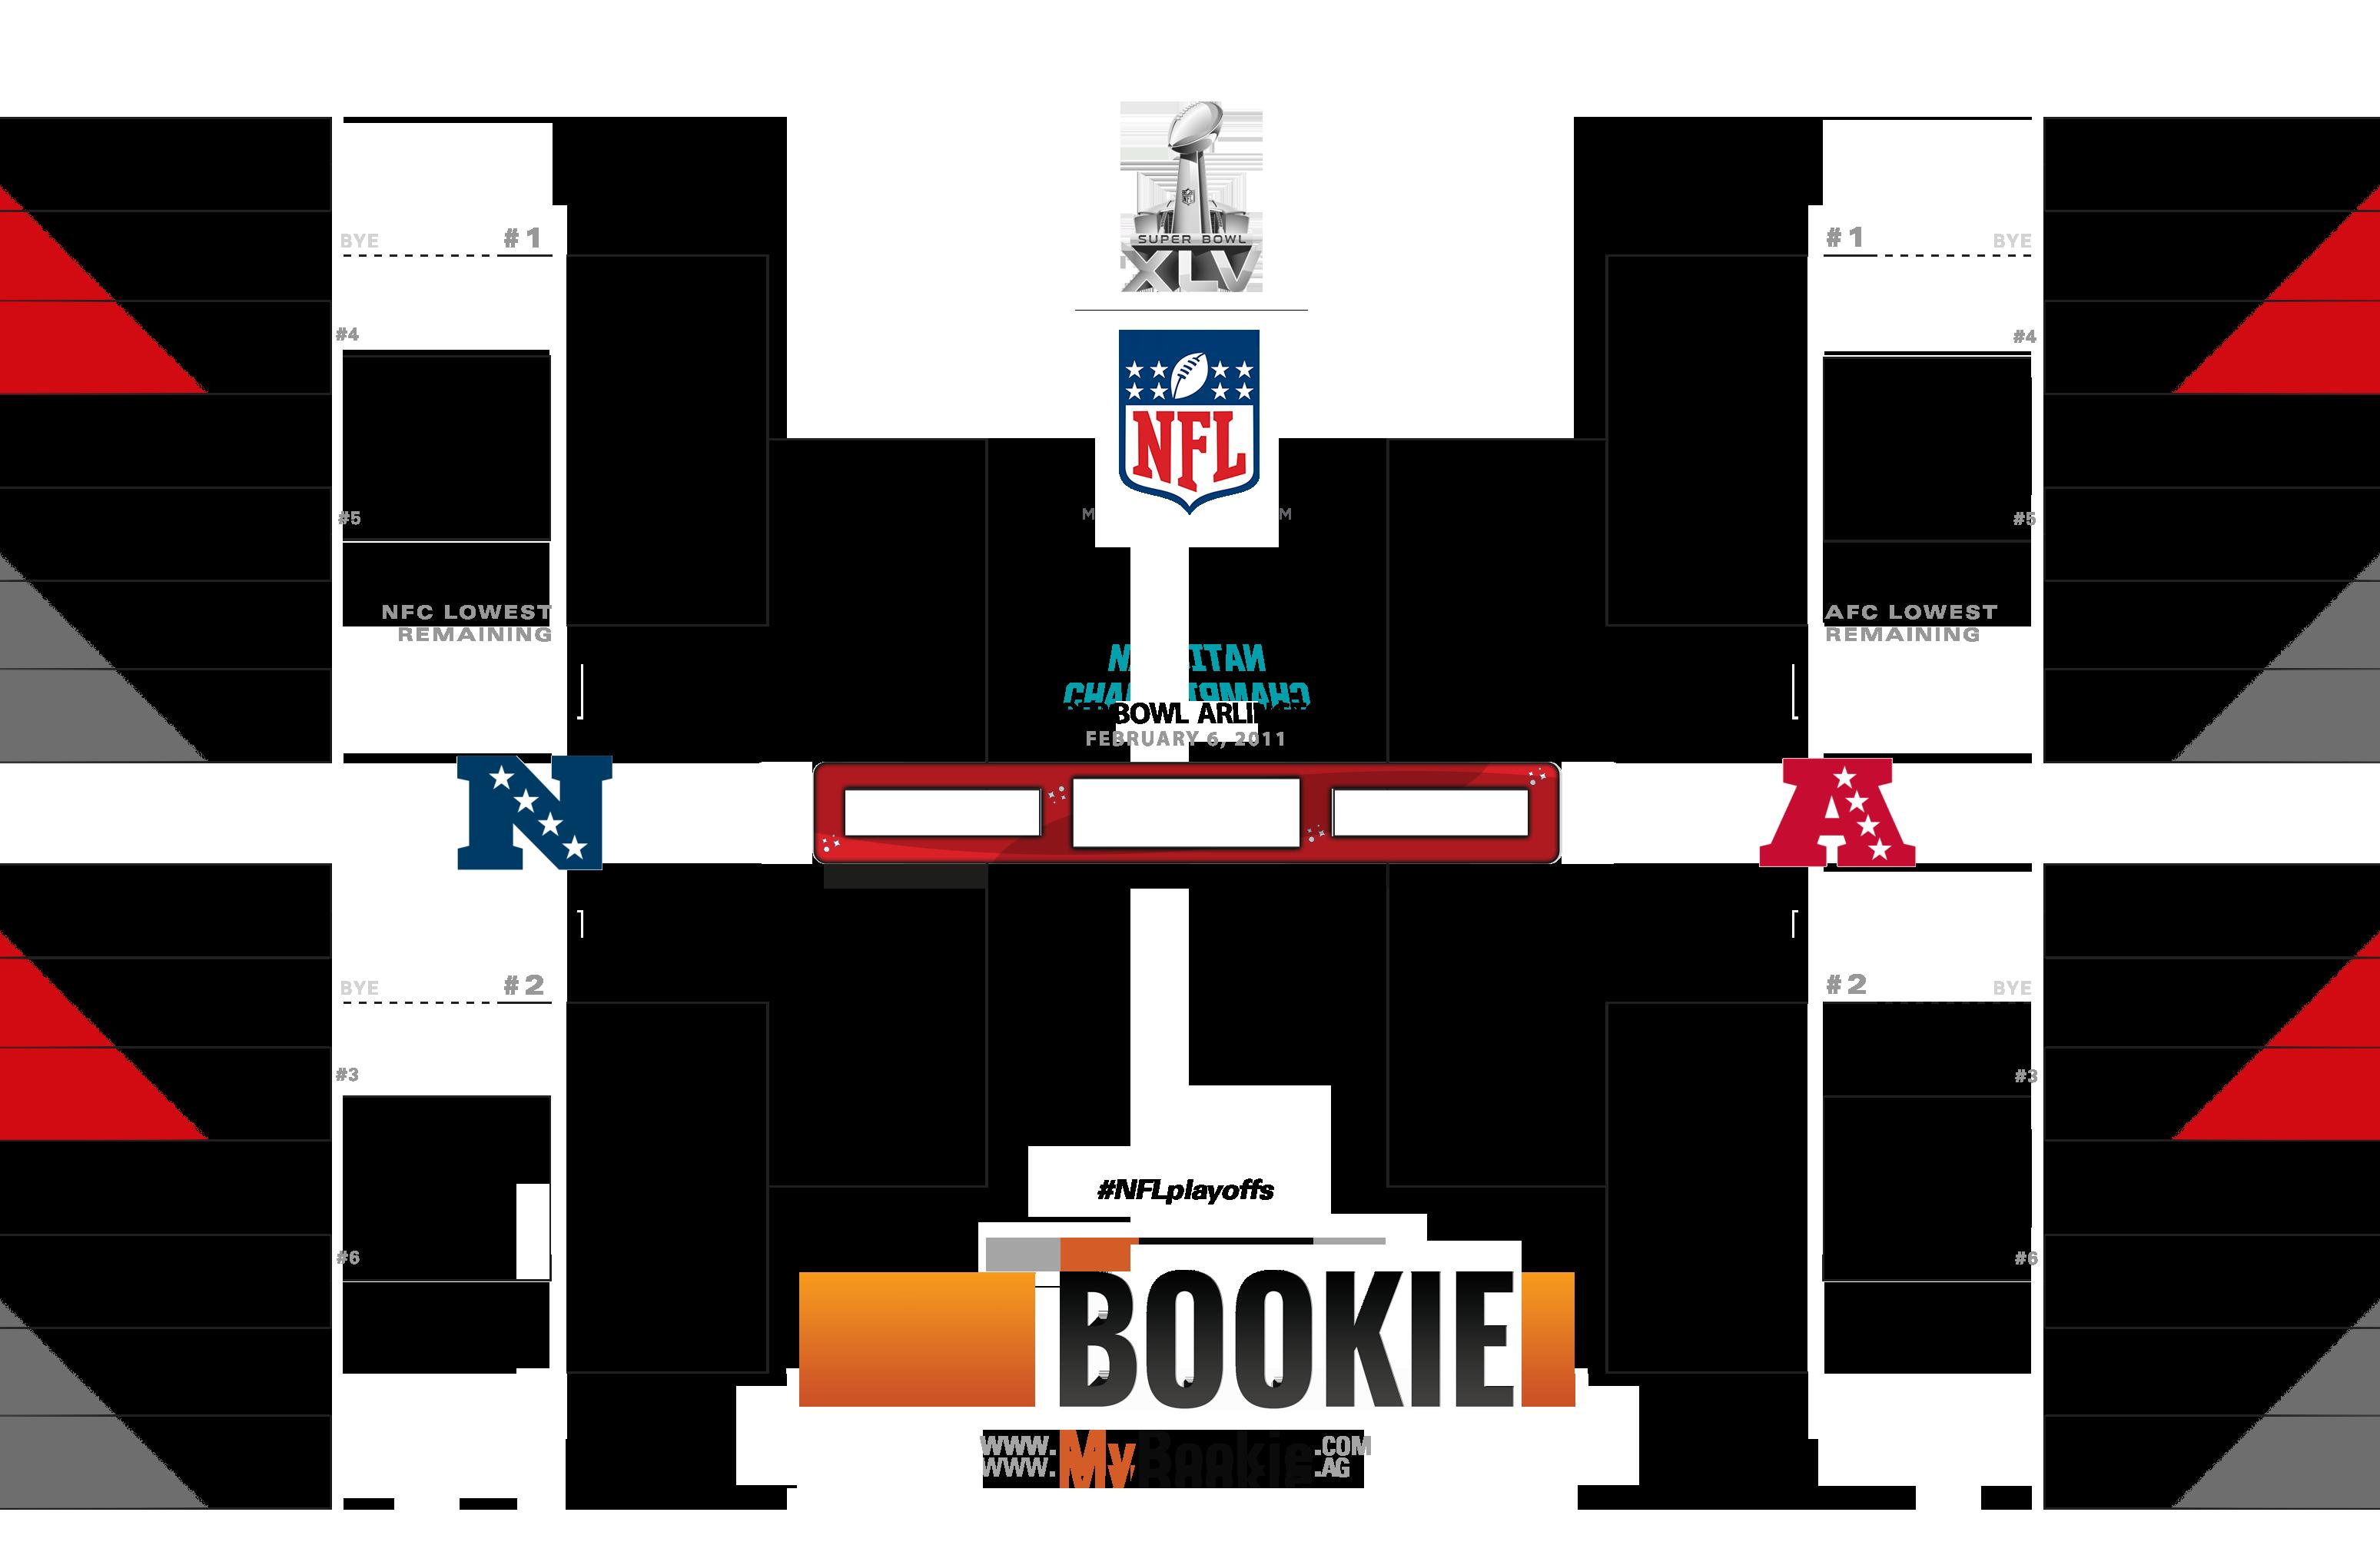 NFL Playoffs / Superbowl 2011 Printable Bracket